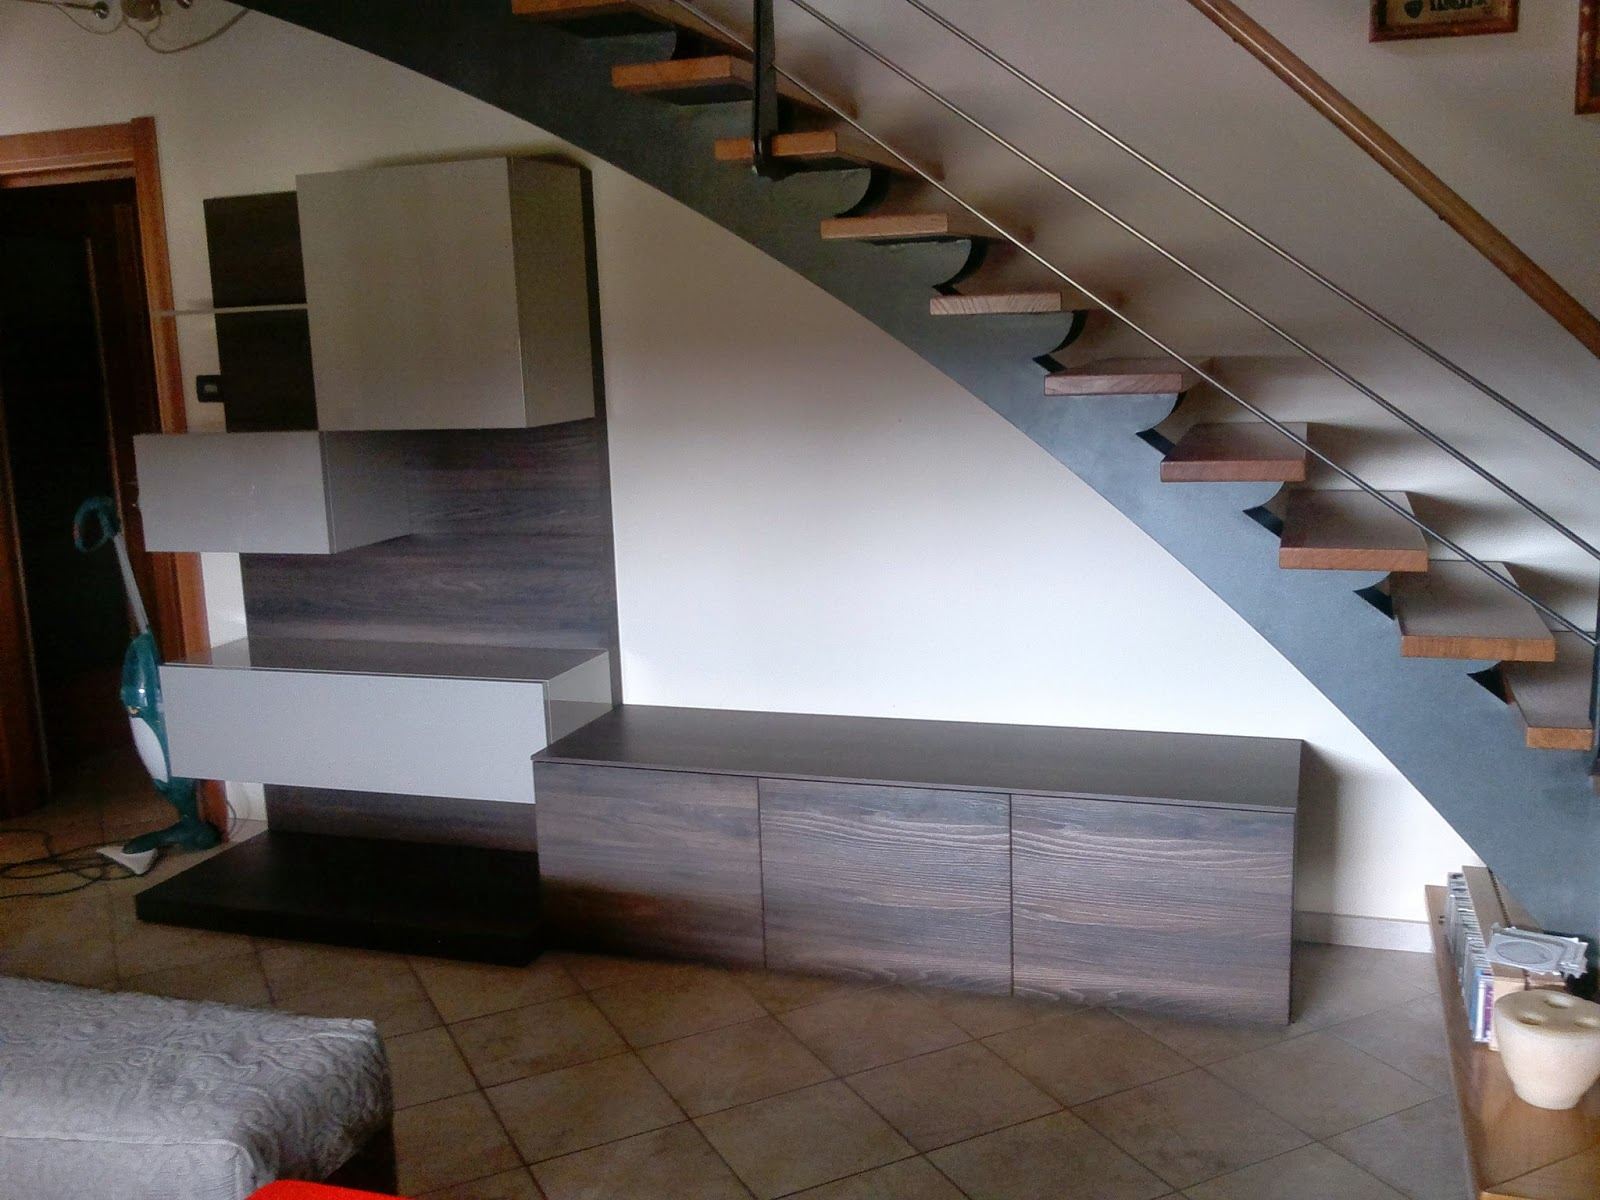 Forum casa nuova indecisione a mille for Arredare casa nuova